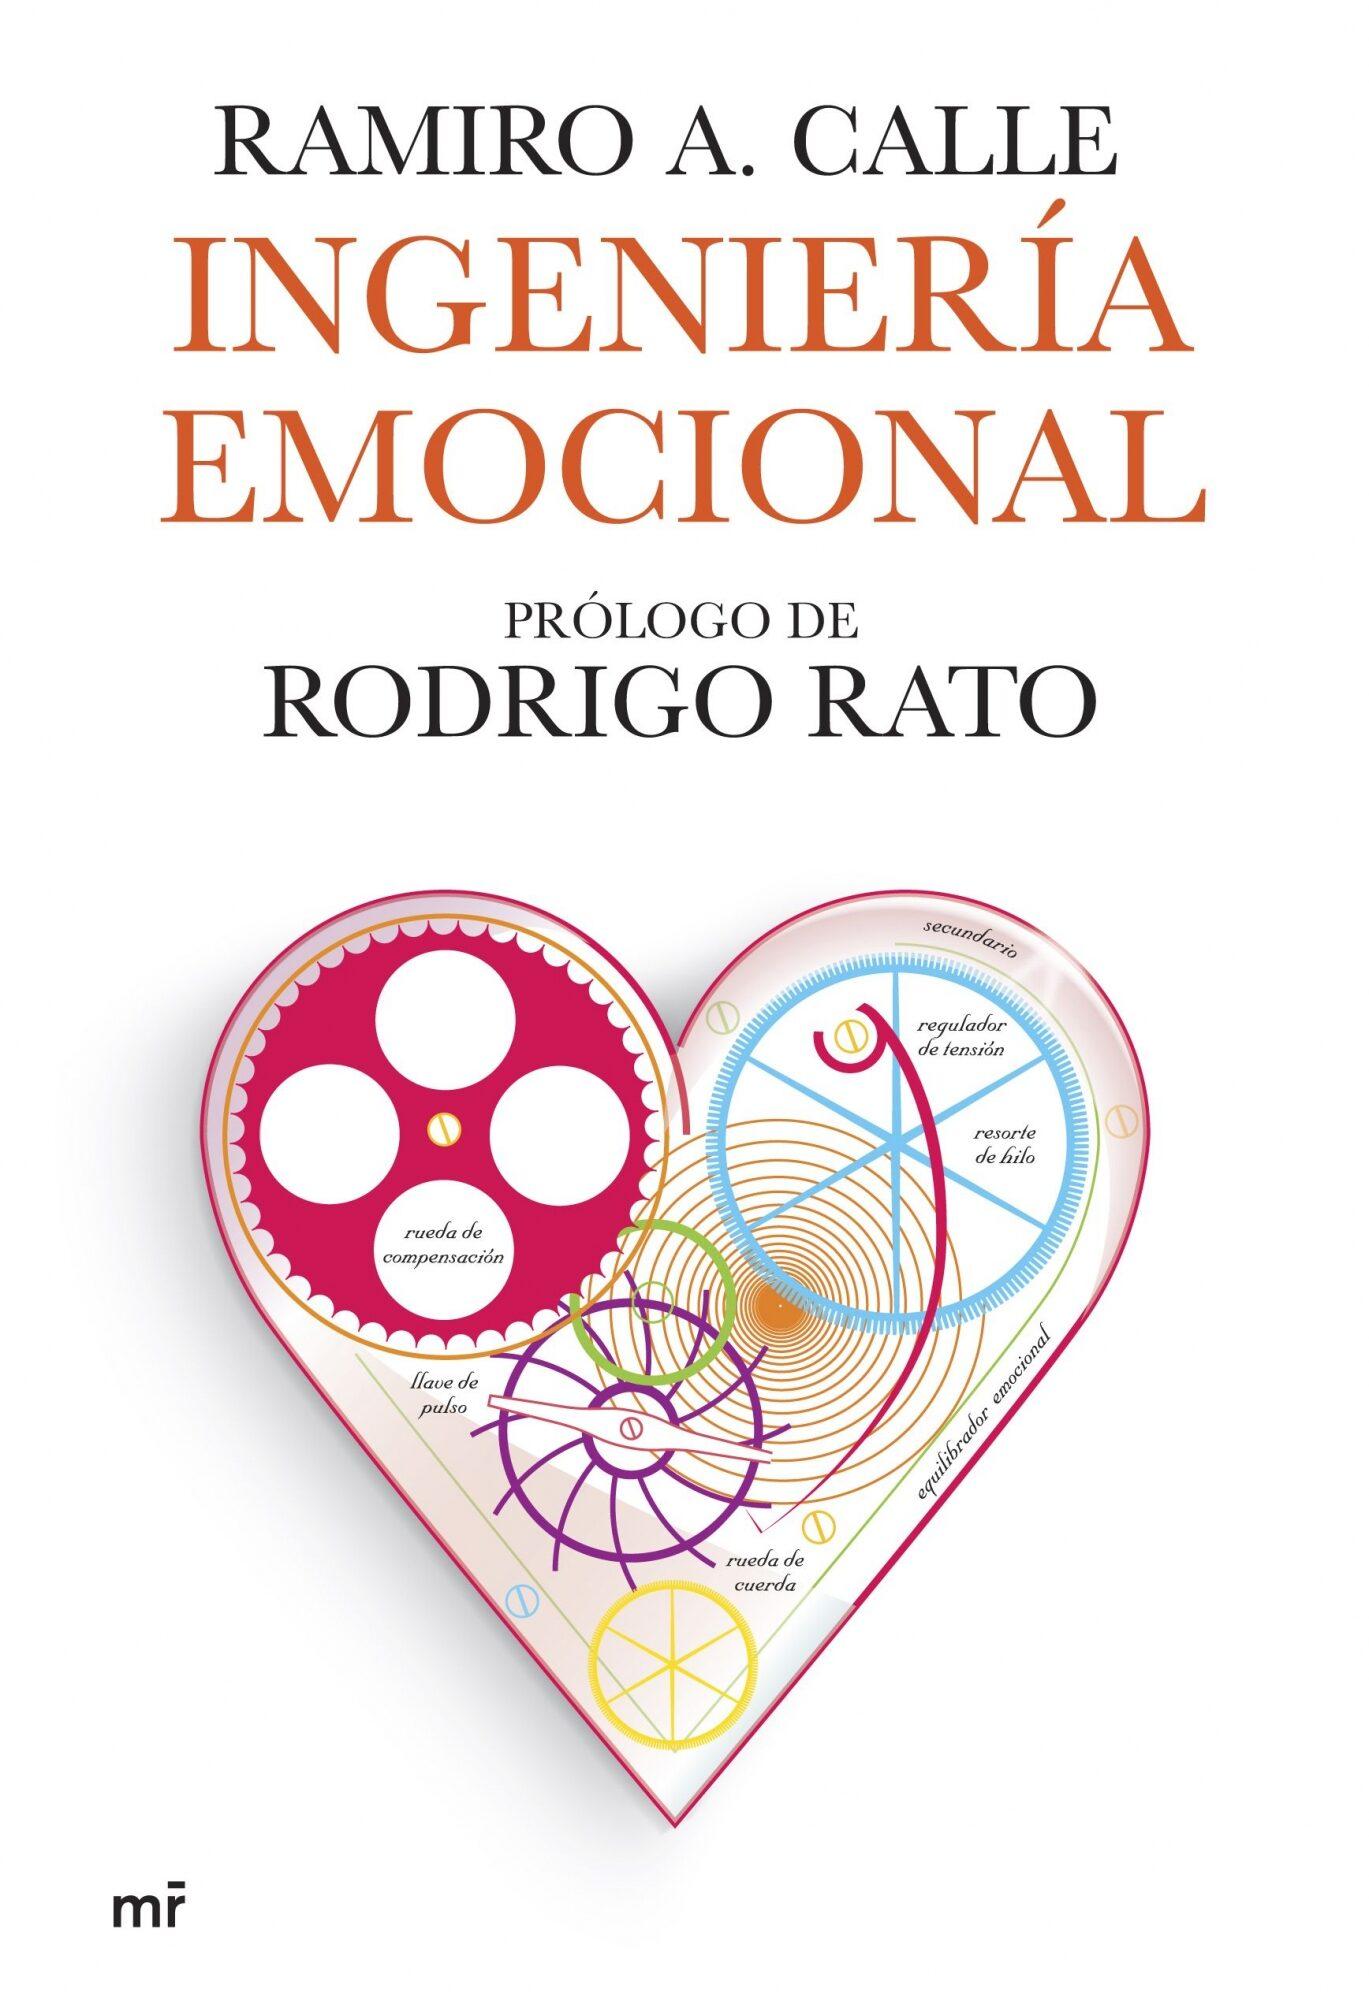 Ingenieria Emocional por Ramiro Calle epub